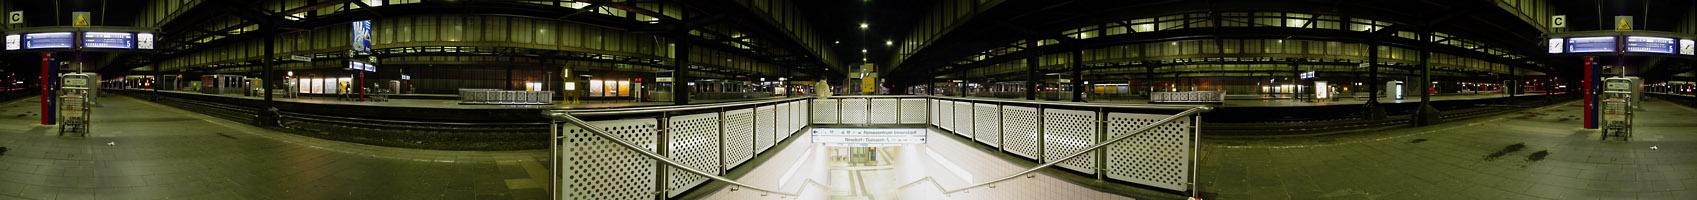 Orientierungslos im Duisburger Bahnhof...